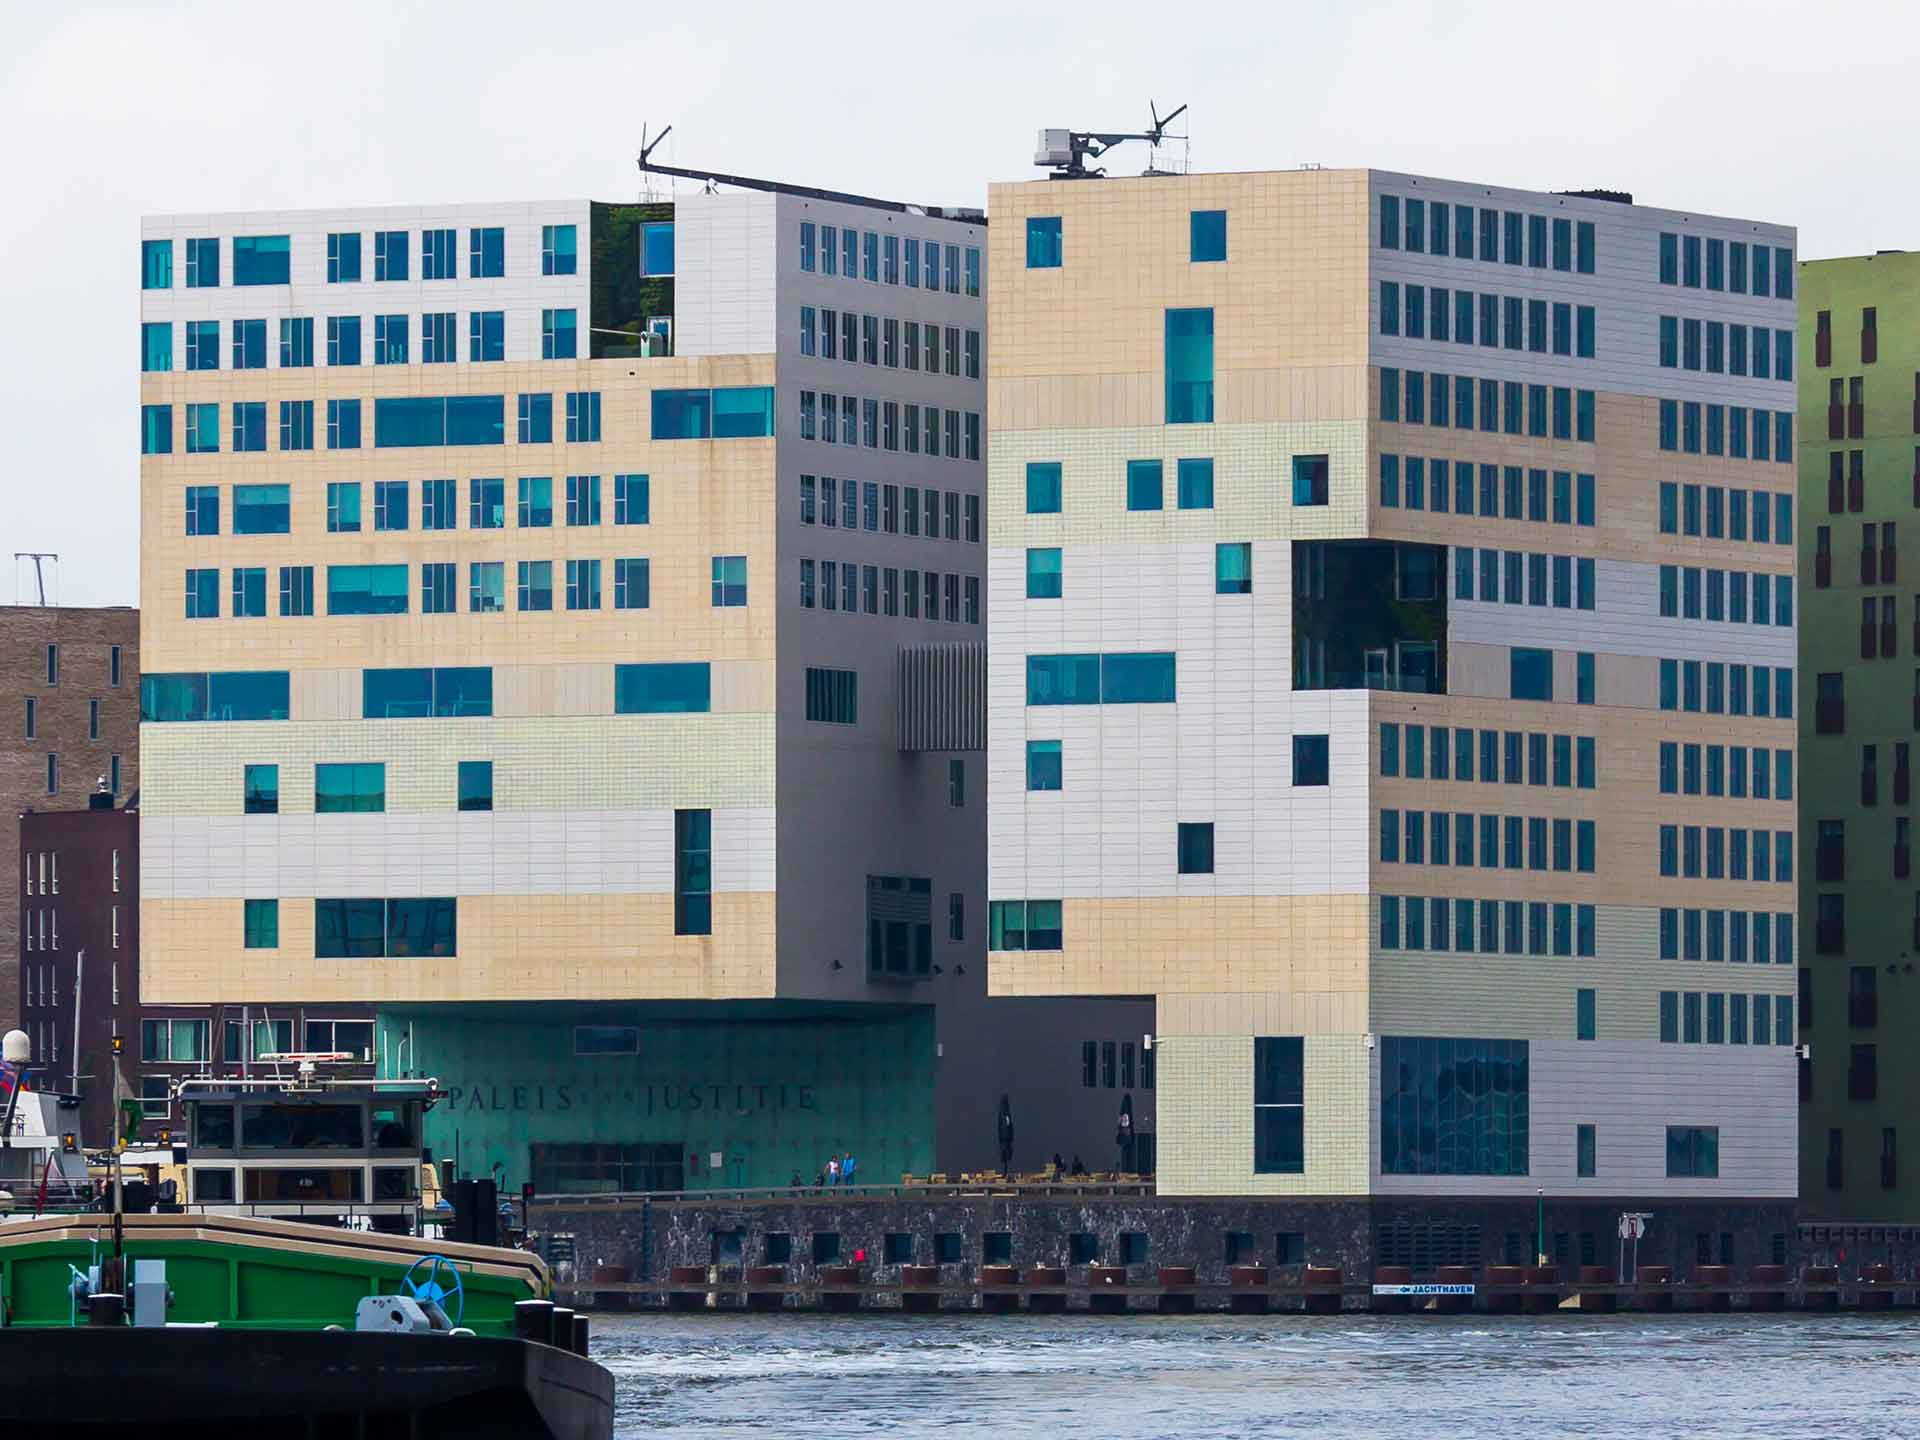 Gerechtshof Amsterdam - Weening Strafrechtadvocaten